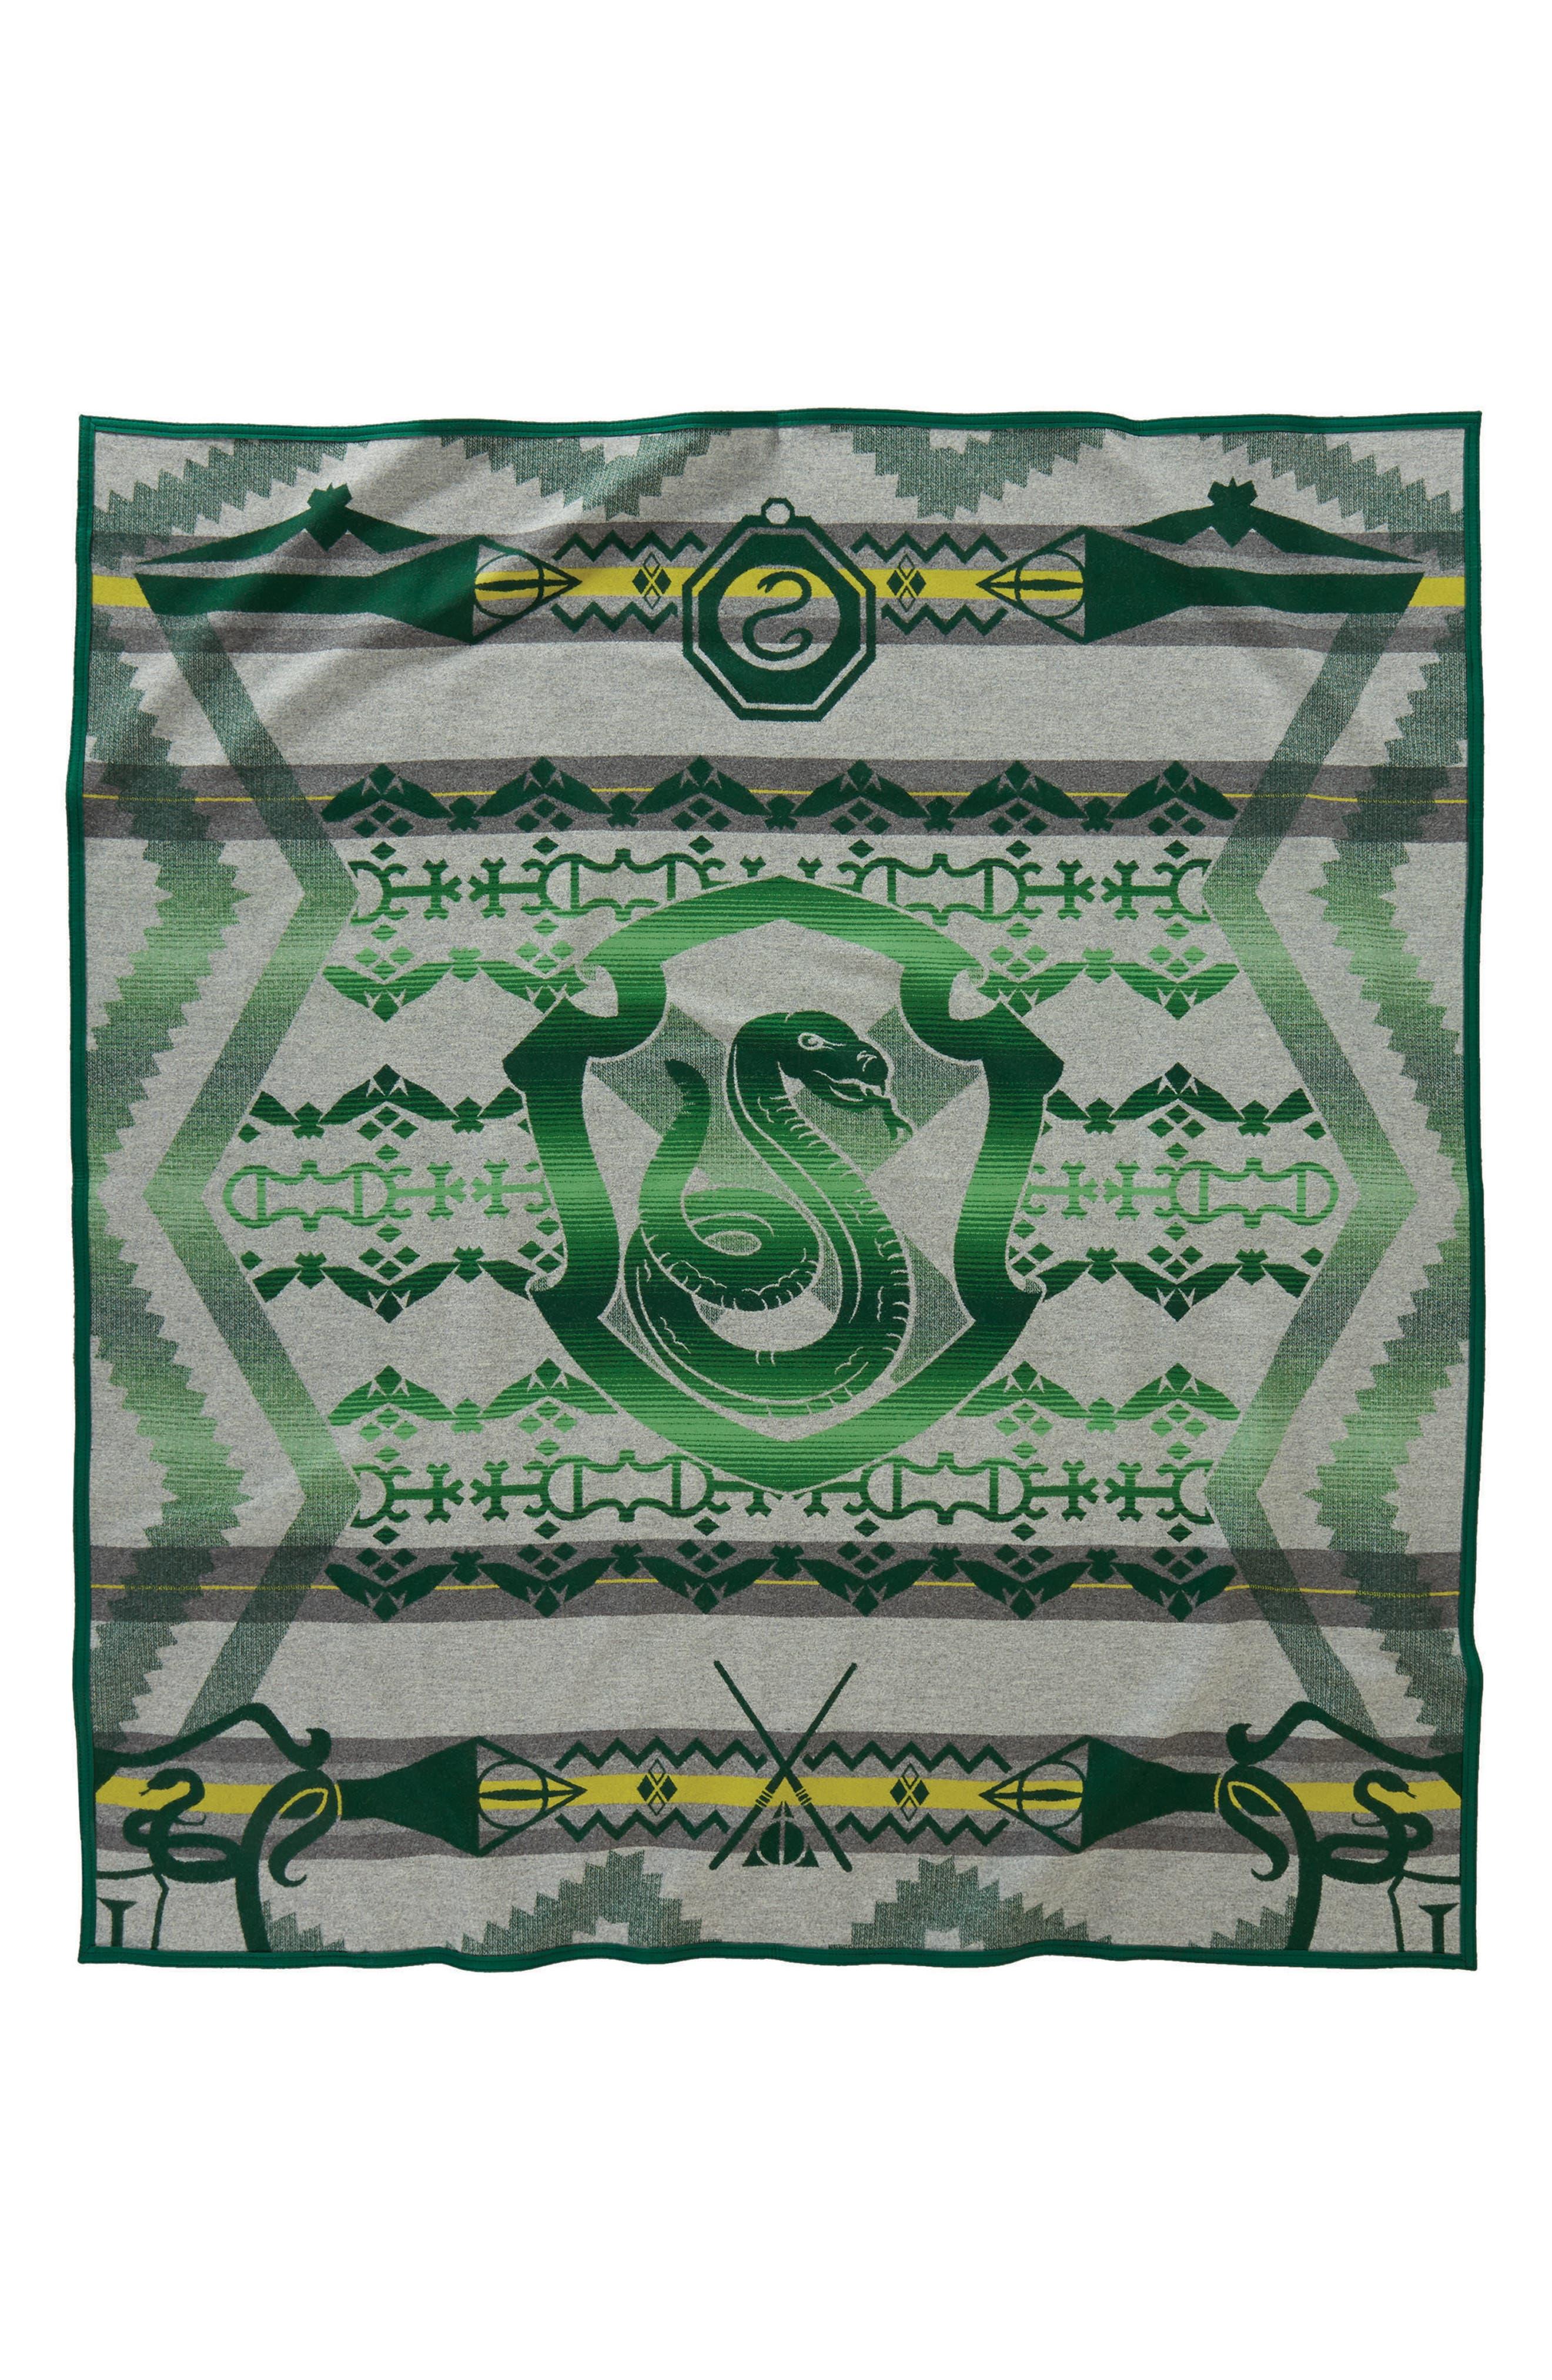 Harry Potter - Slytherin Blanket,                             Alternate thumbnail 2, color,                             300